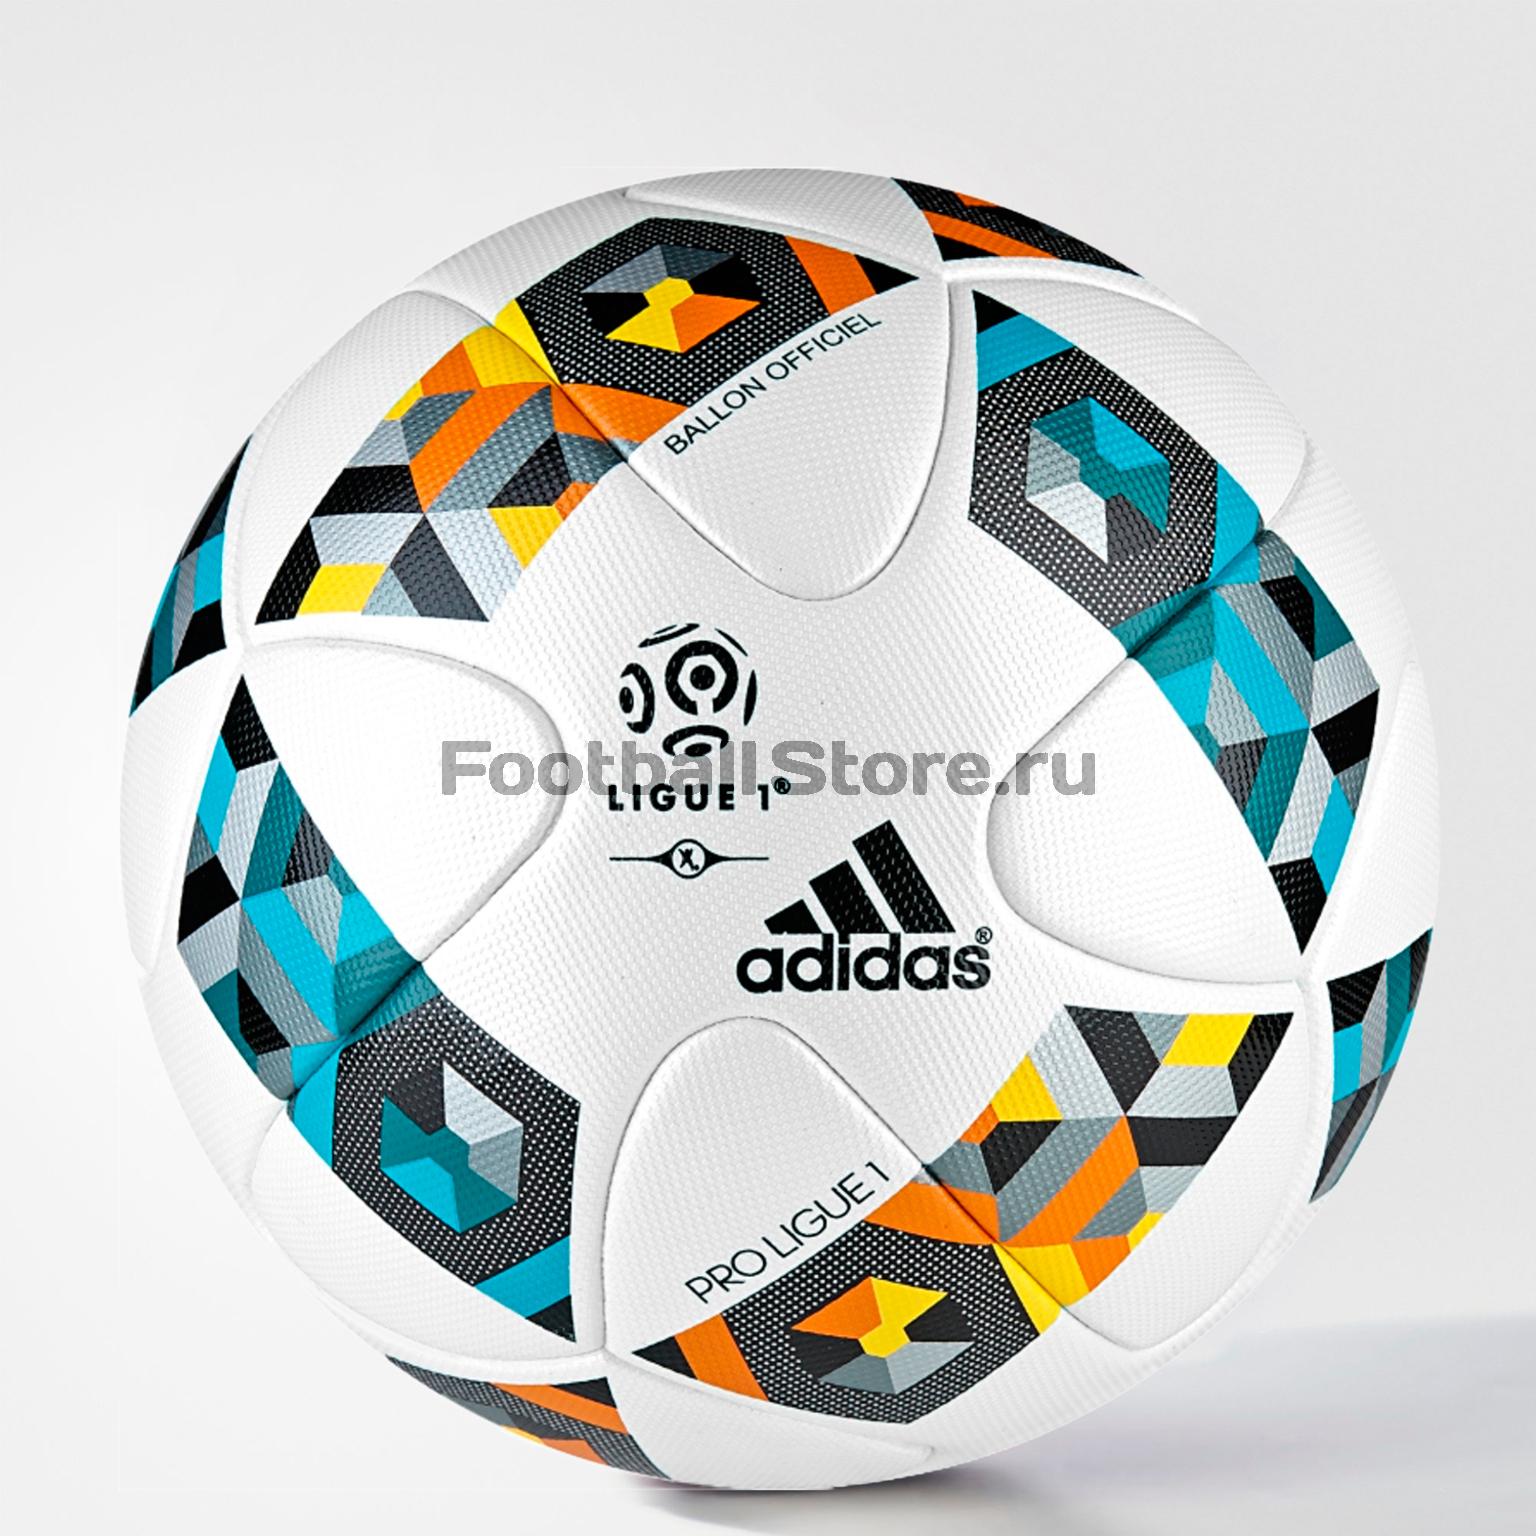 Adidas Мяч Adidas ProLigue 1 OMB AZ3544 adidas мяч adidas offpitch sala ao3271